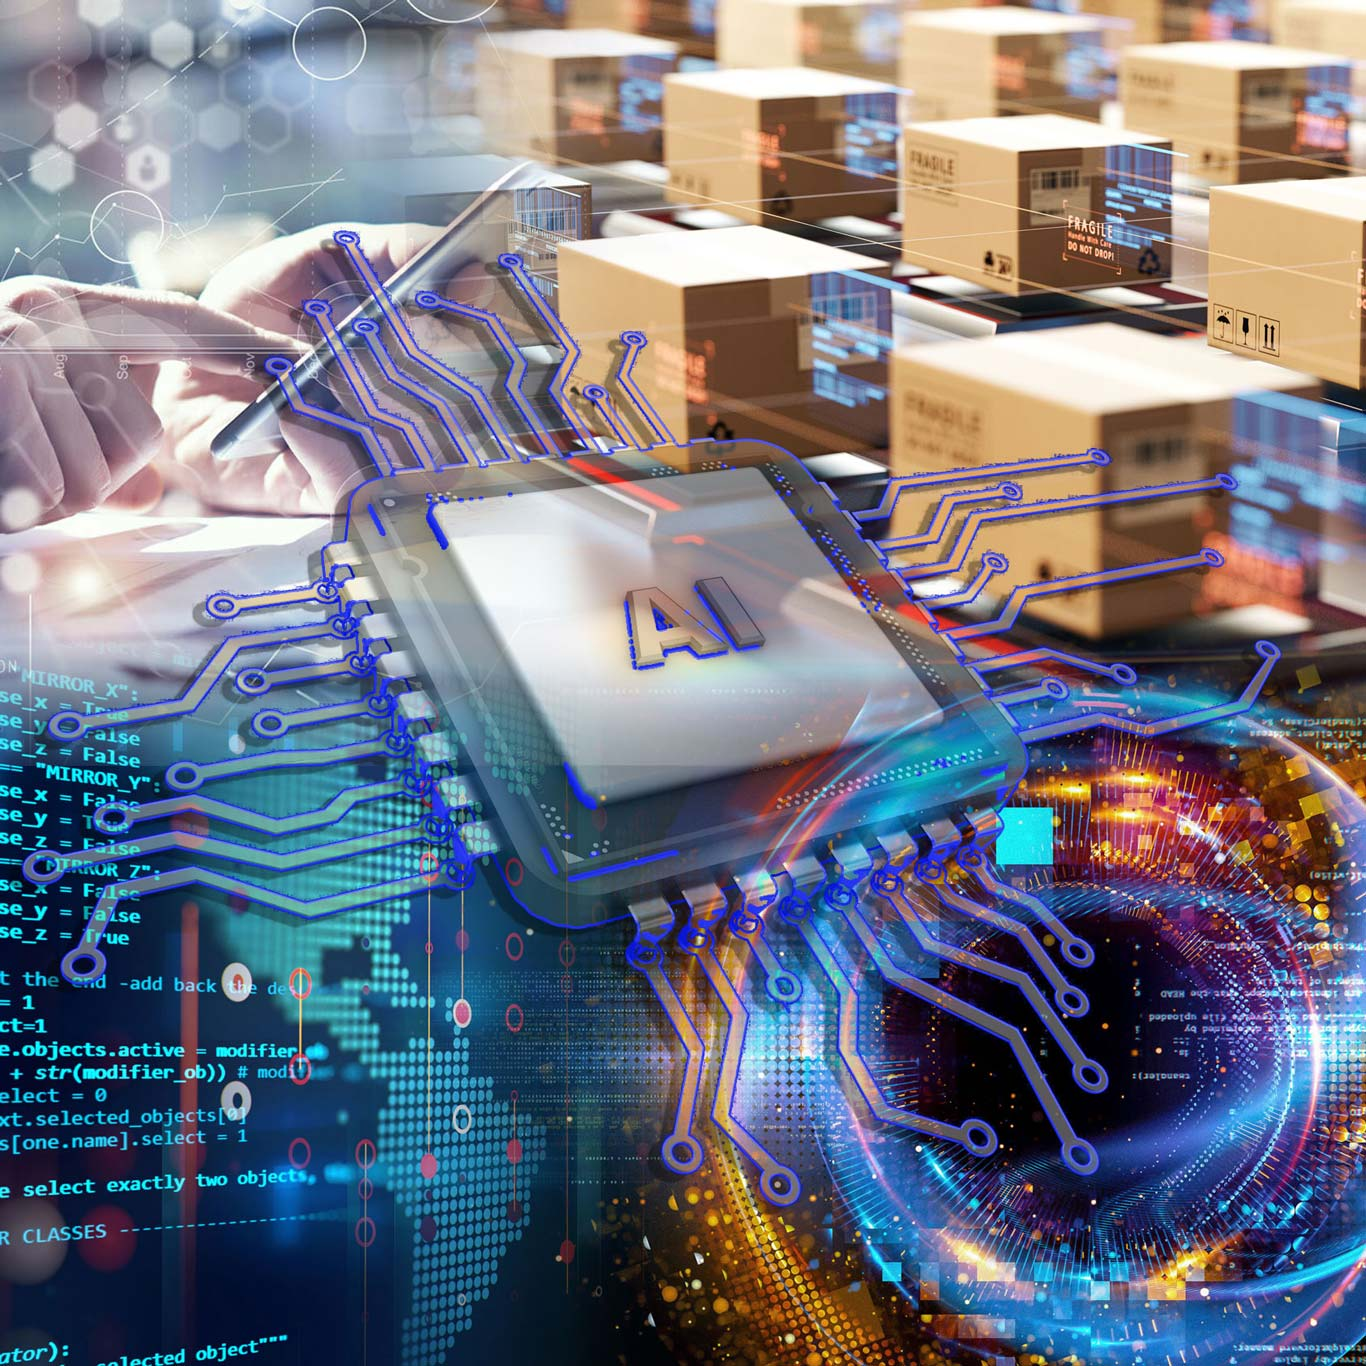 Operationalizing intelligent data-driven systems